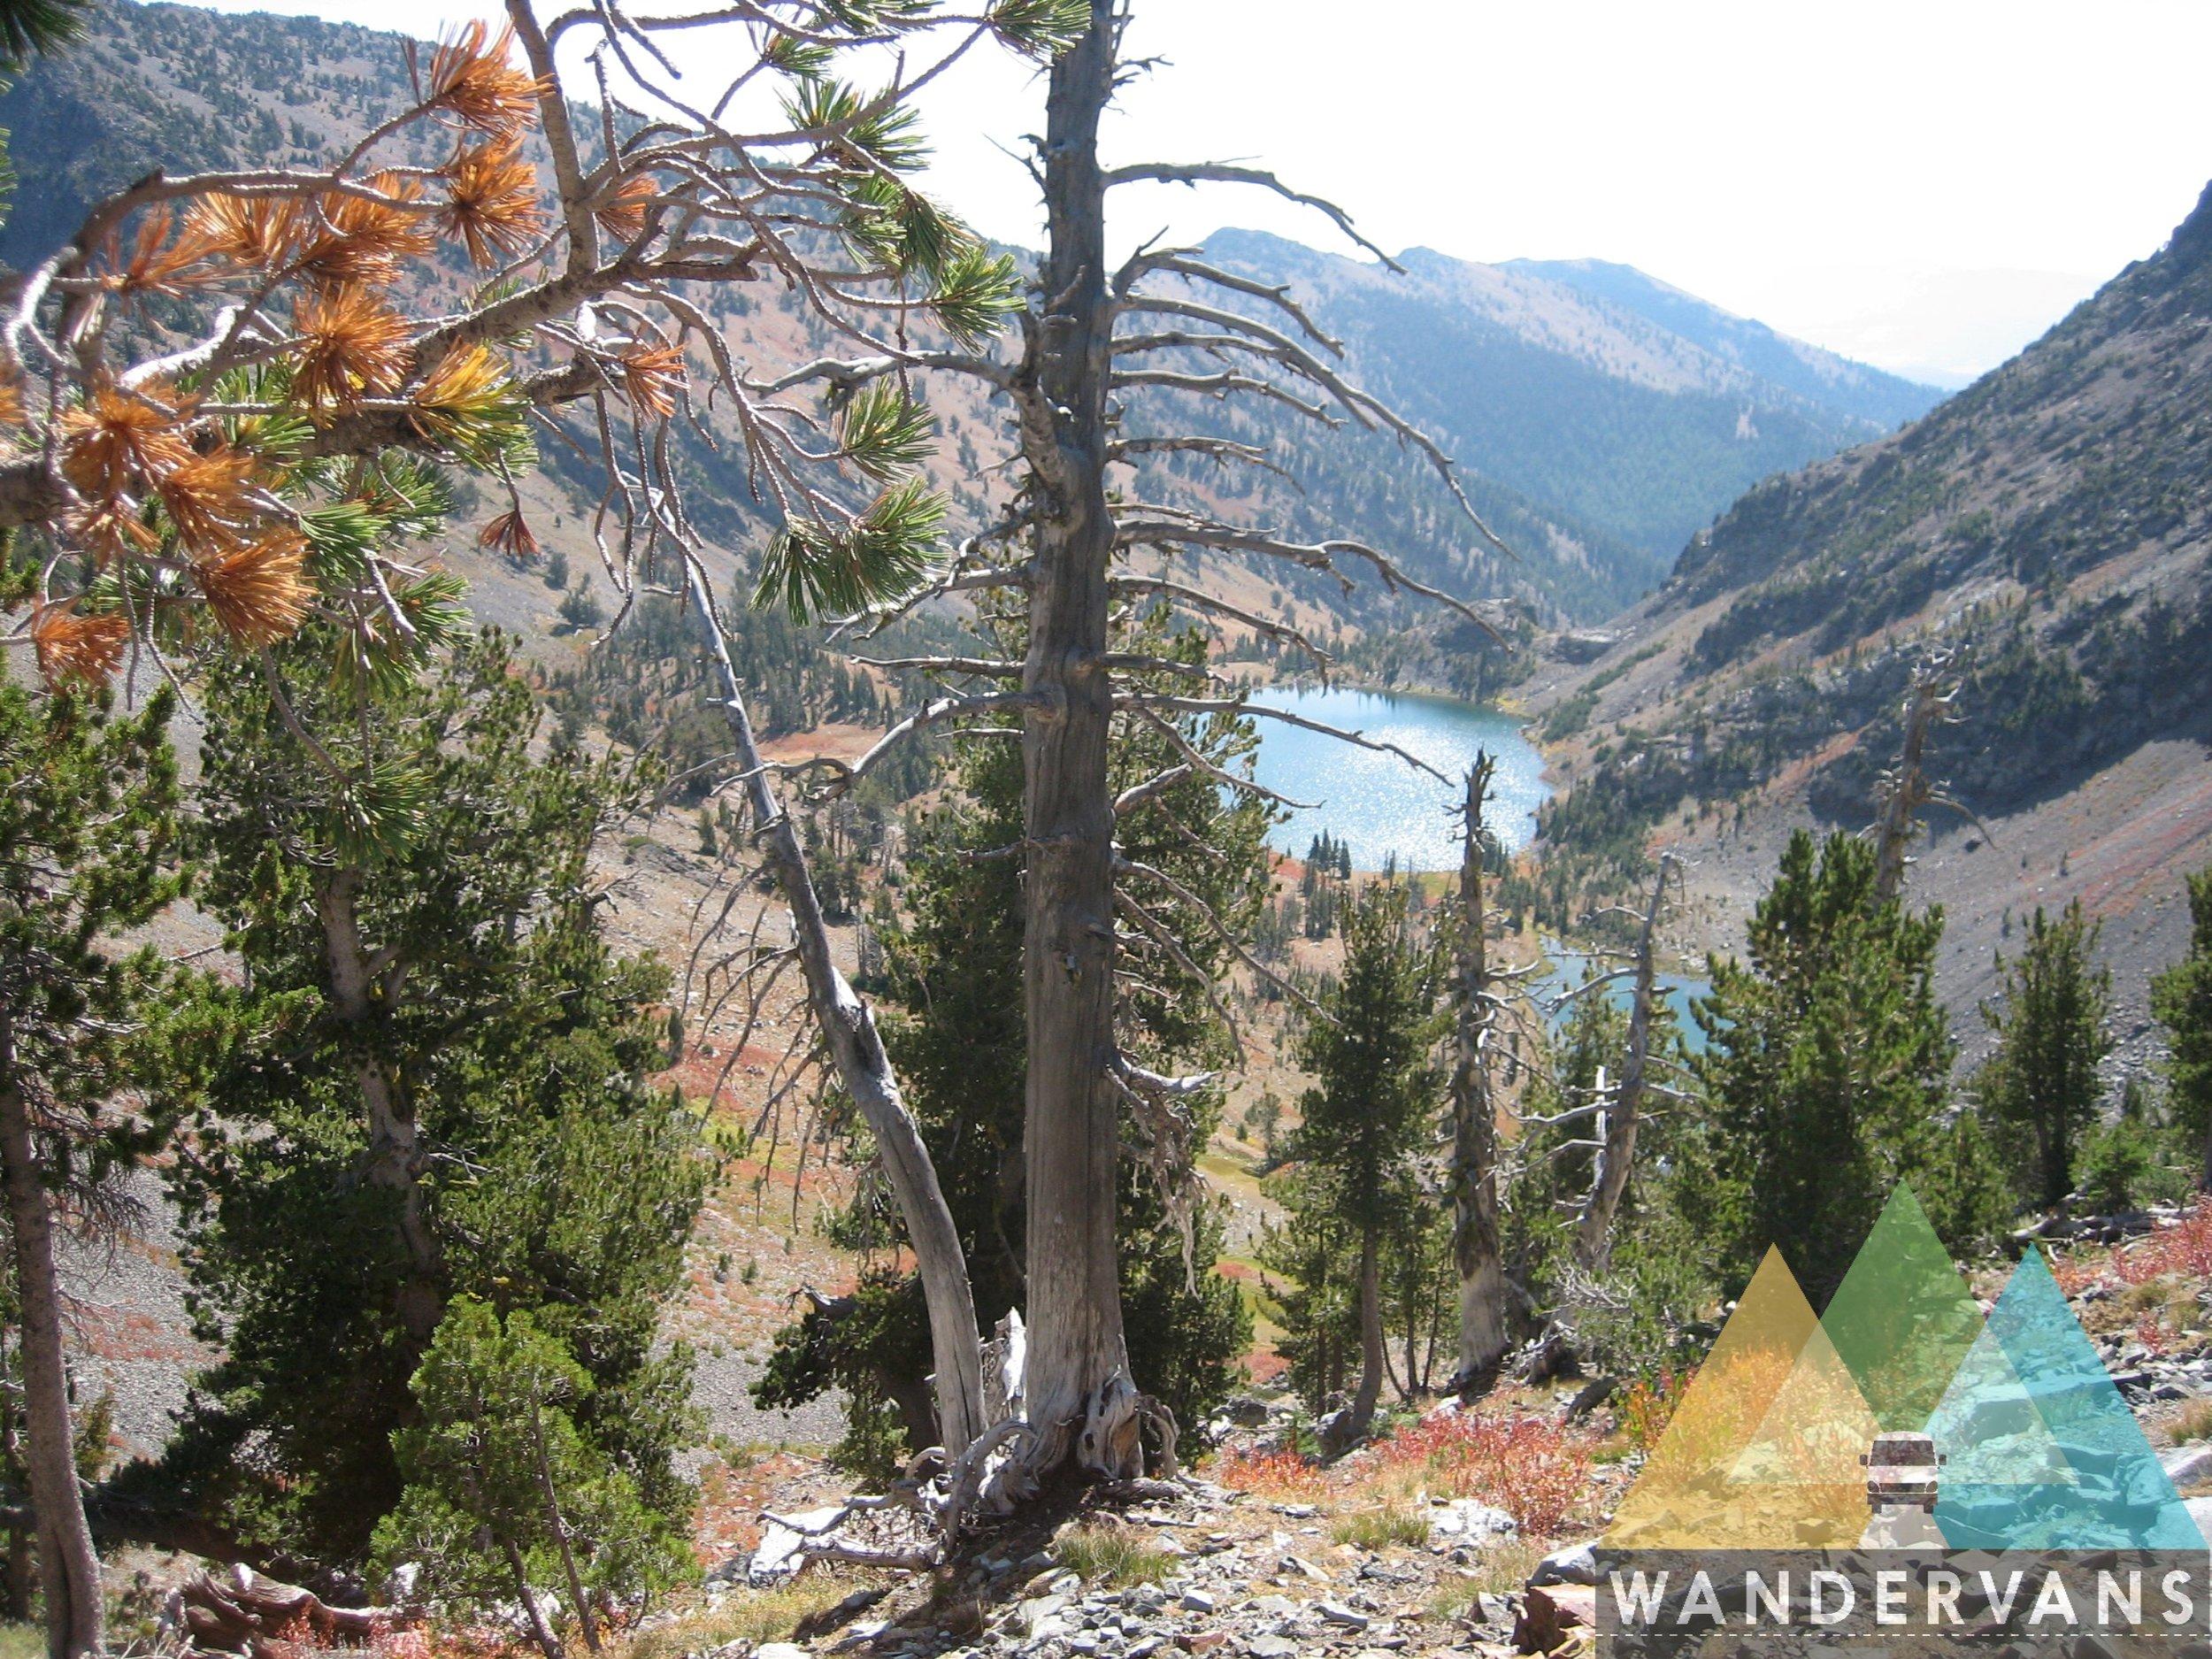 vanlife-rv-campervan-rent-idaho-sun-valley-boise-wandervans-wanderlust-skiing-backcountry-snowboard-sawtooth-eastern-oregon-biking-baker-city